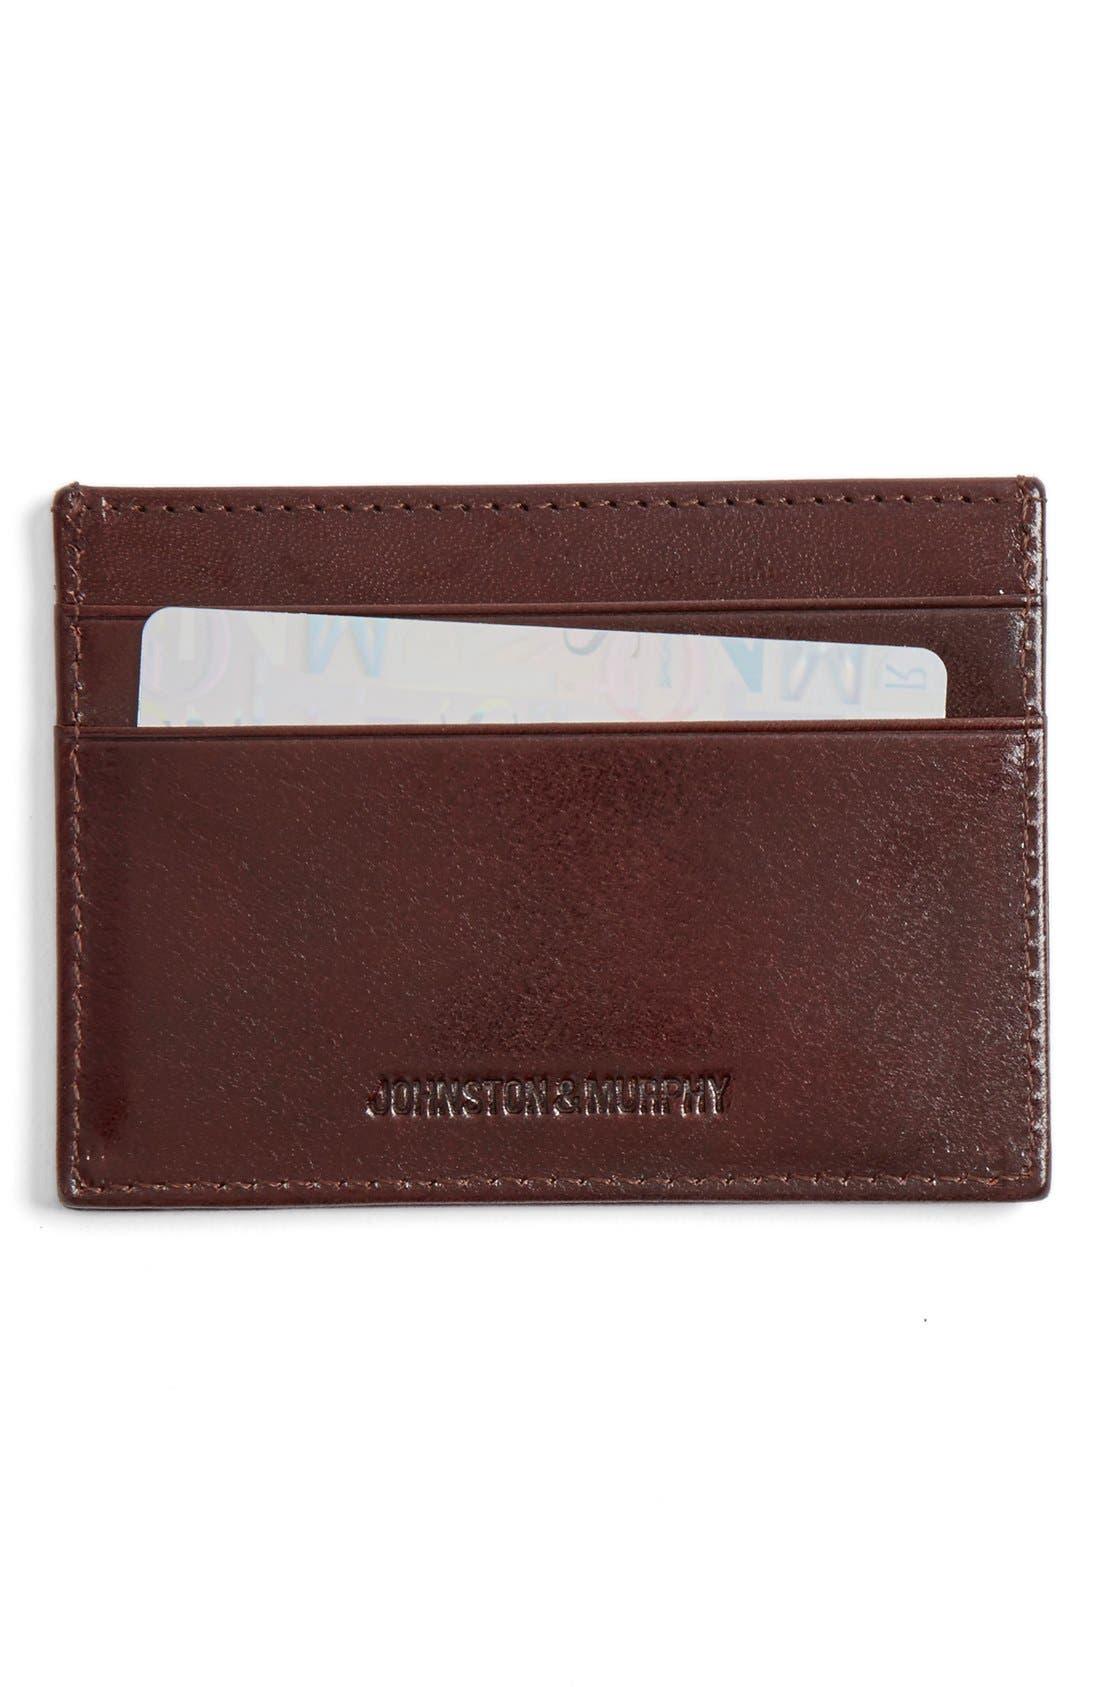 Johnston & Murphy Leather Card Case